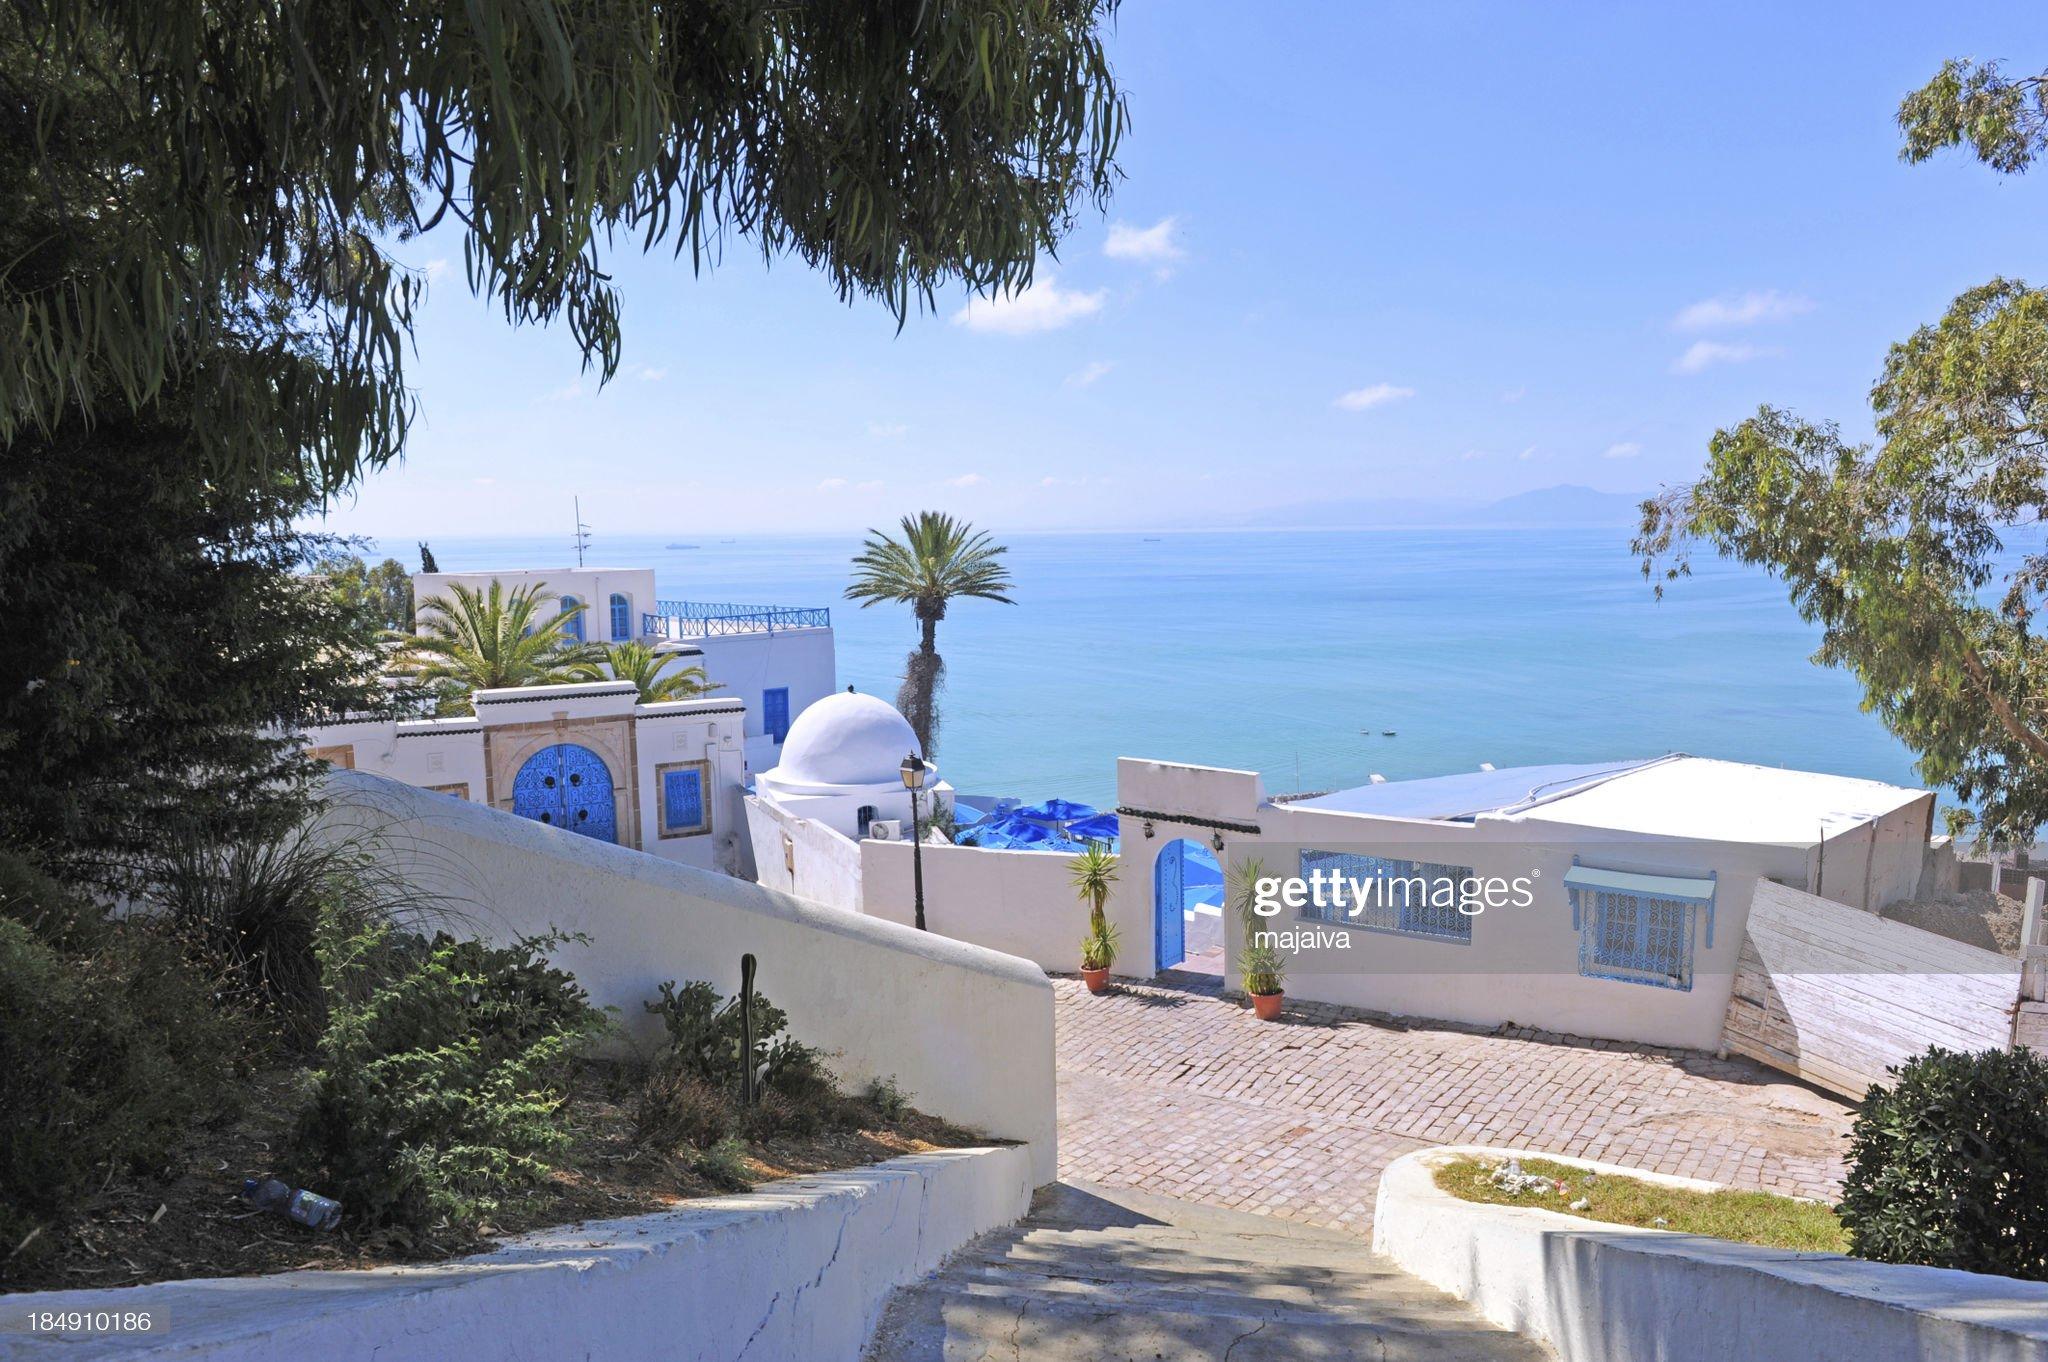 Sidi Bou Said : Foto stock